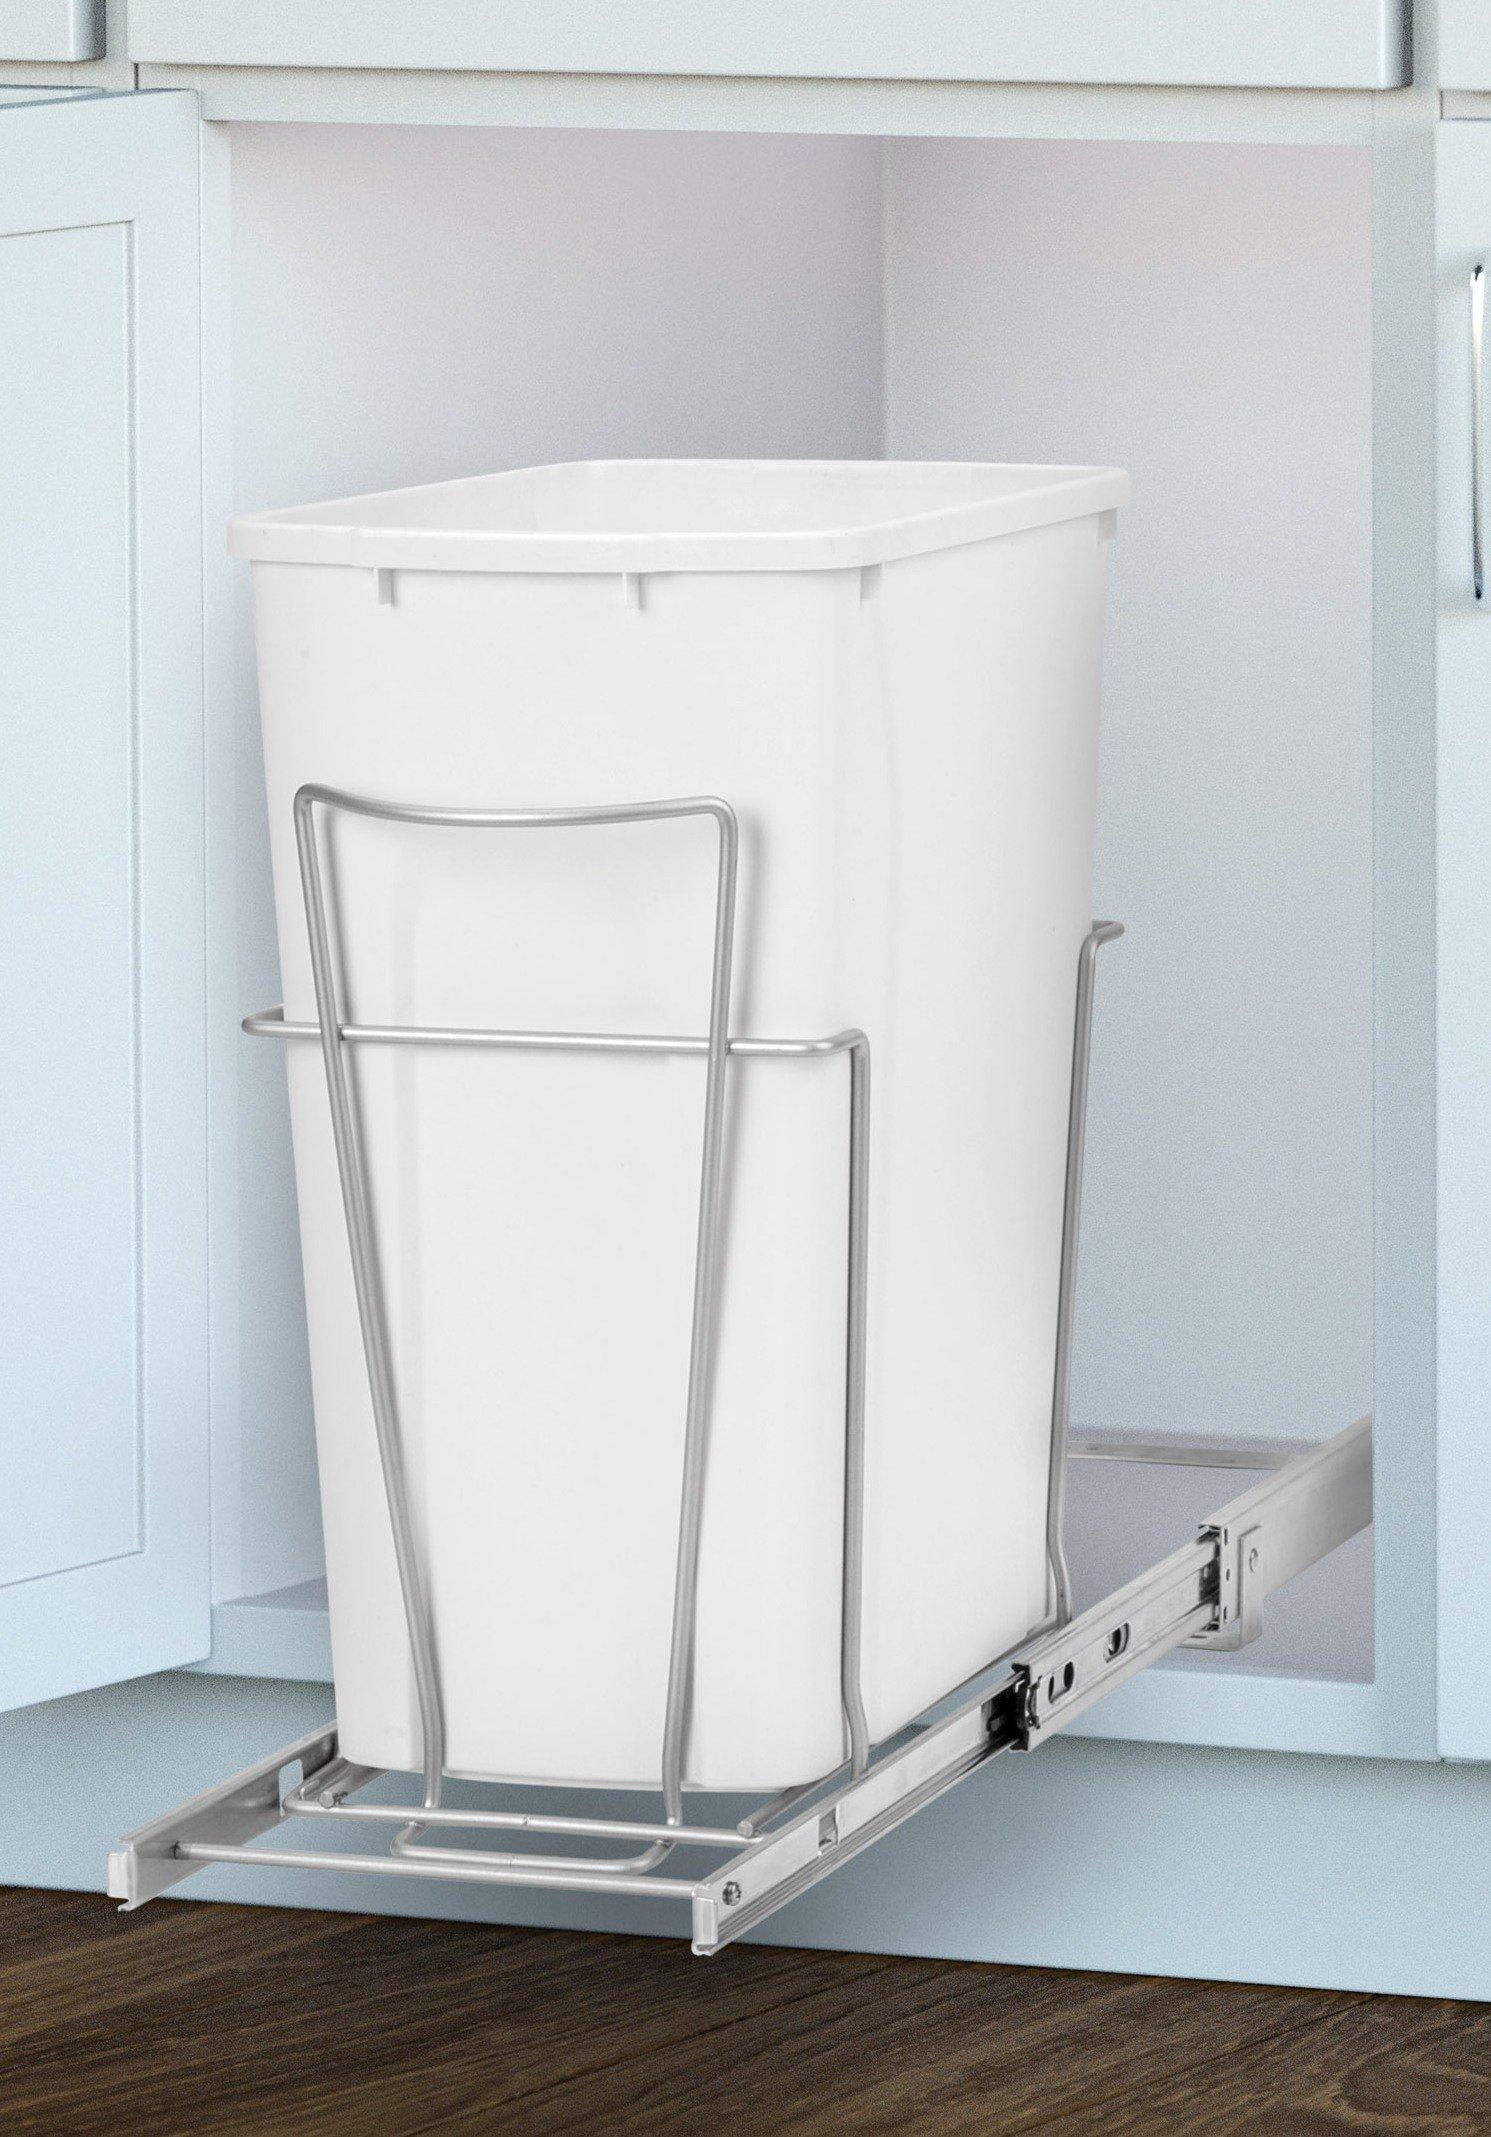 Panacea Grayline Slide-Out Single Trash Can Basket Storage, Satin Nickel